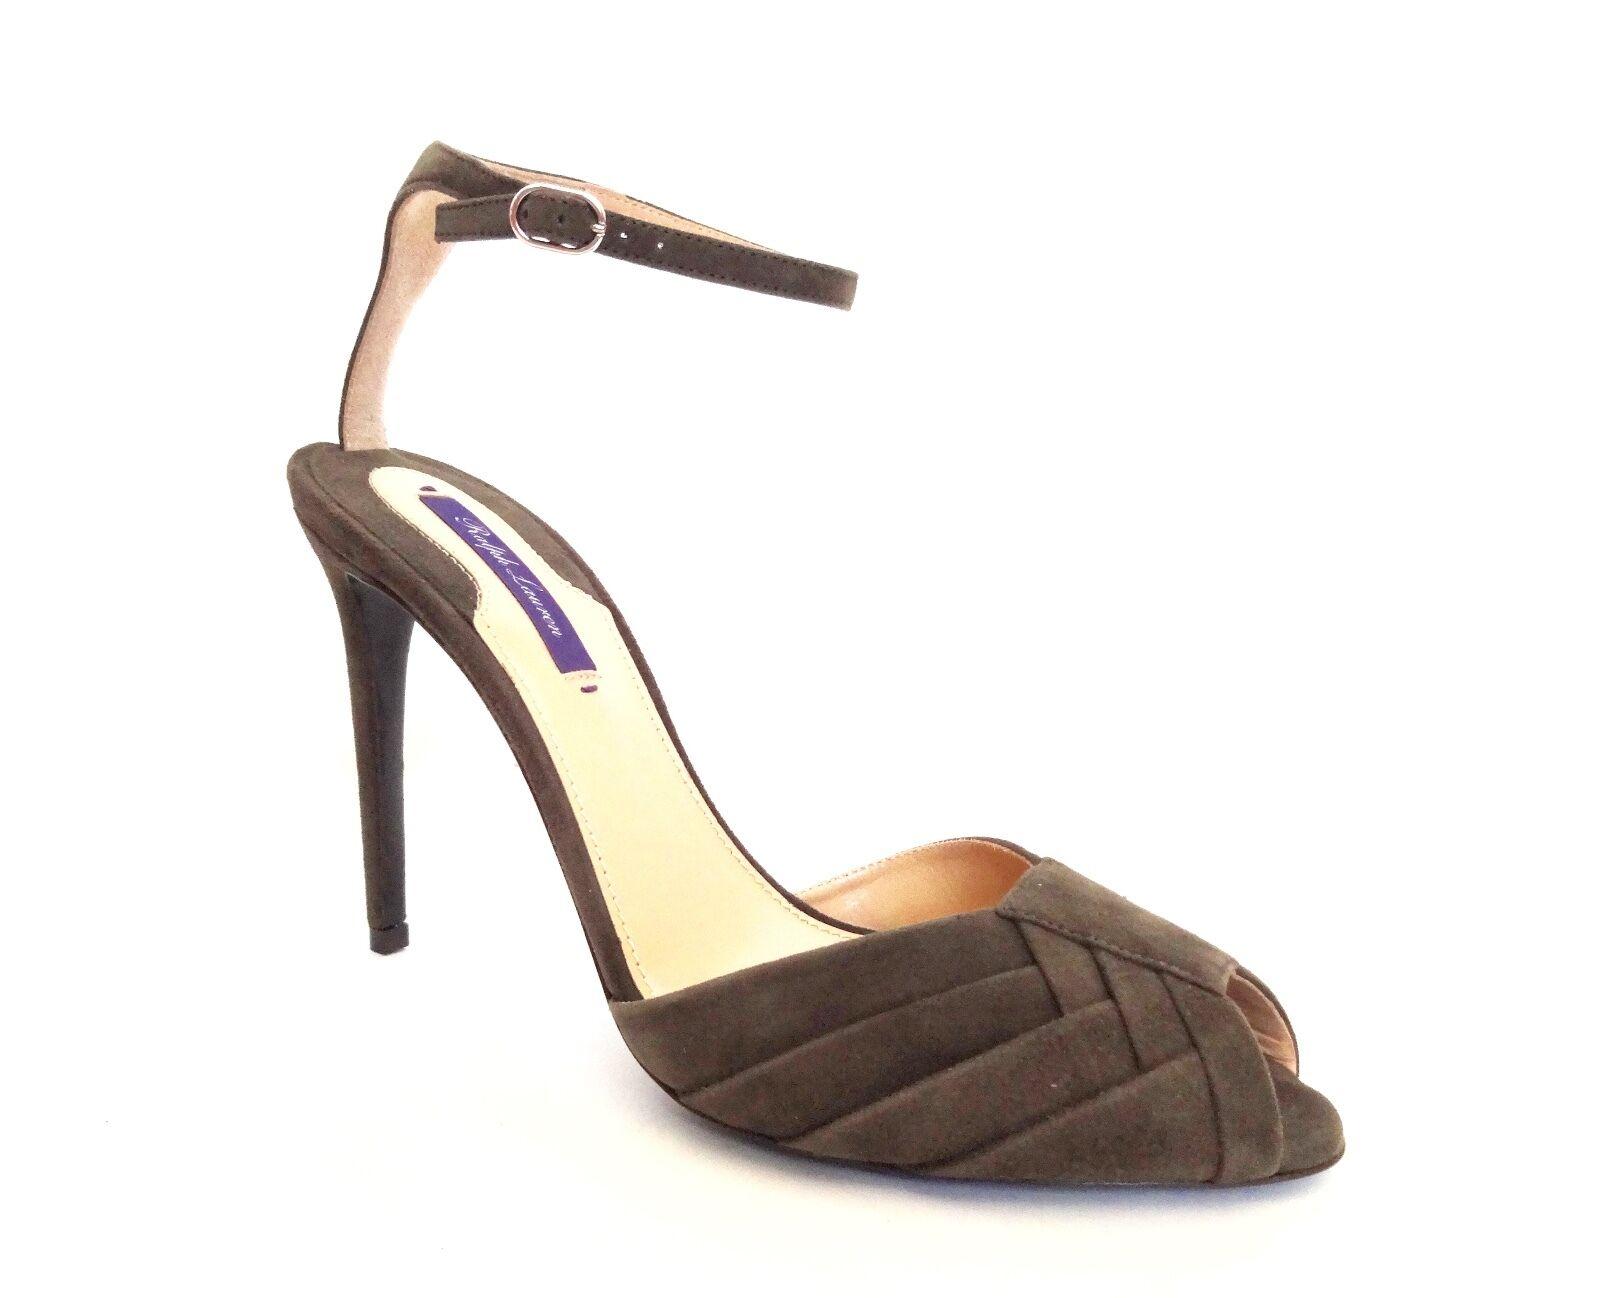 i nuovi marchi outlet online New Ralph Lauren Collection Blamina Olive Olive Olive verde Suede Sandals Heels scarpe 38.5 B  prendiamo i clienti come nostro dio